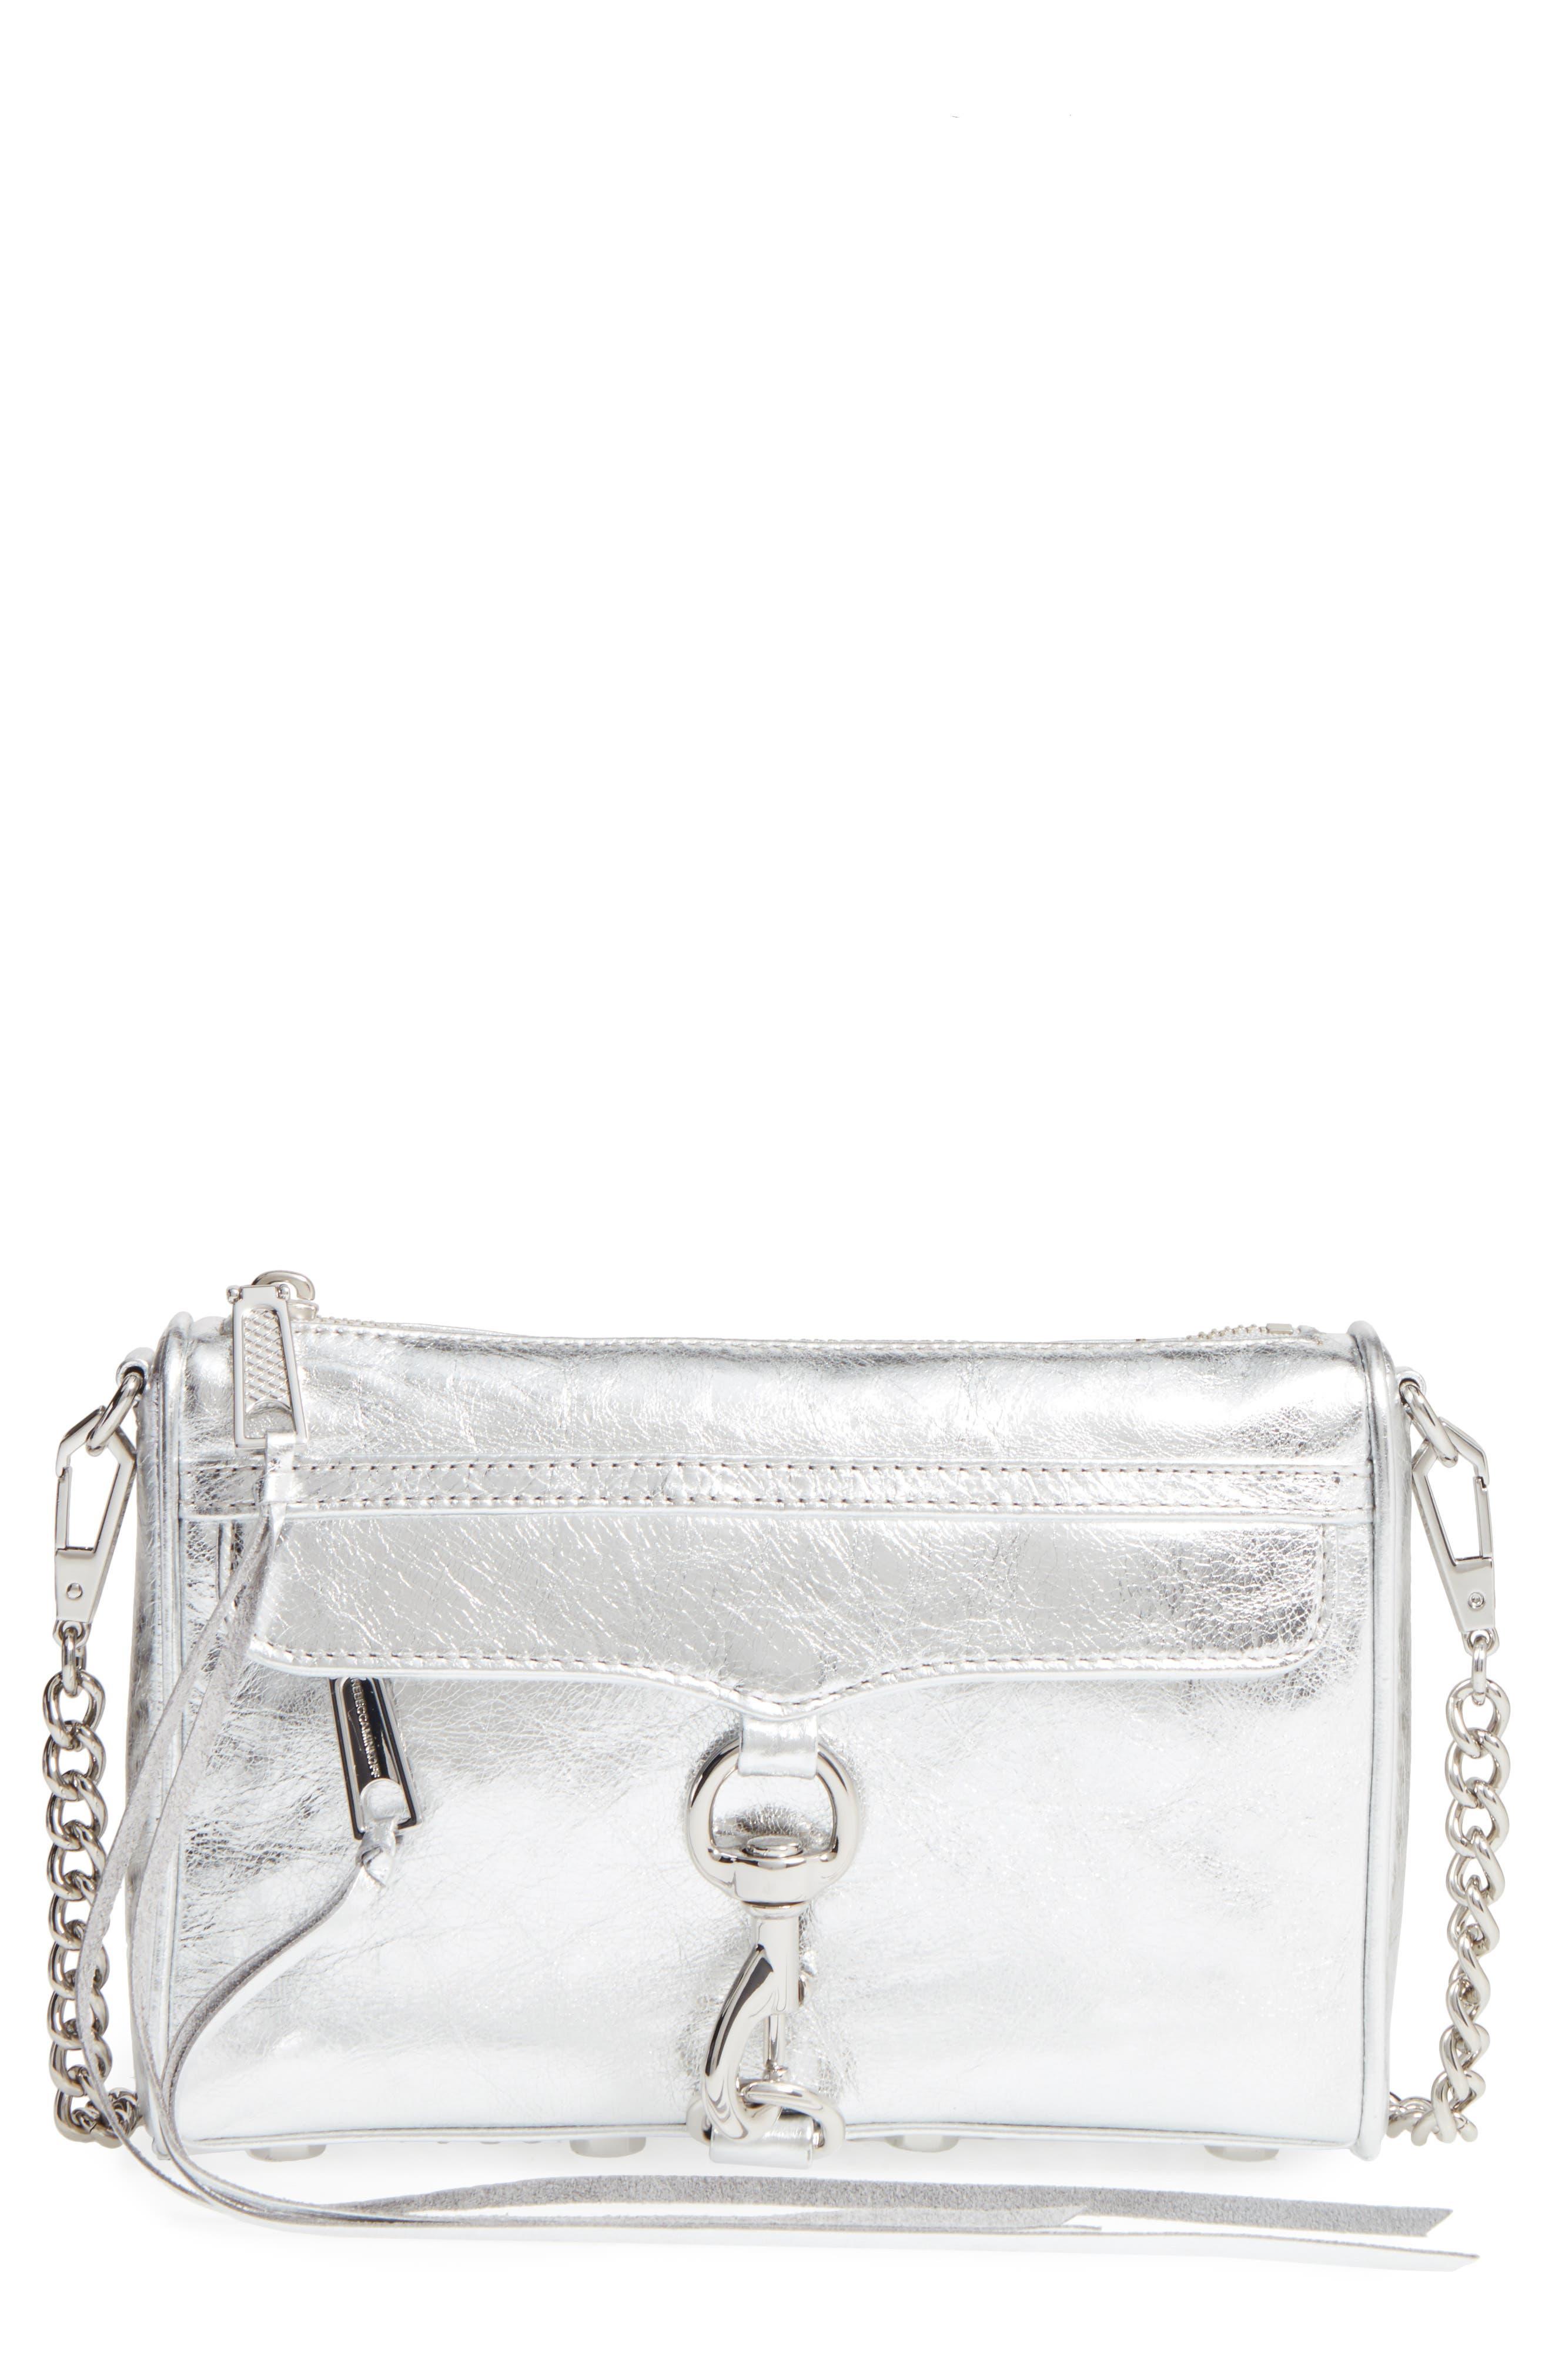 Rebecca Minkoff Mini MAC Metallic Leather Crossbody Bag